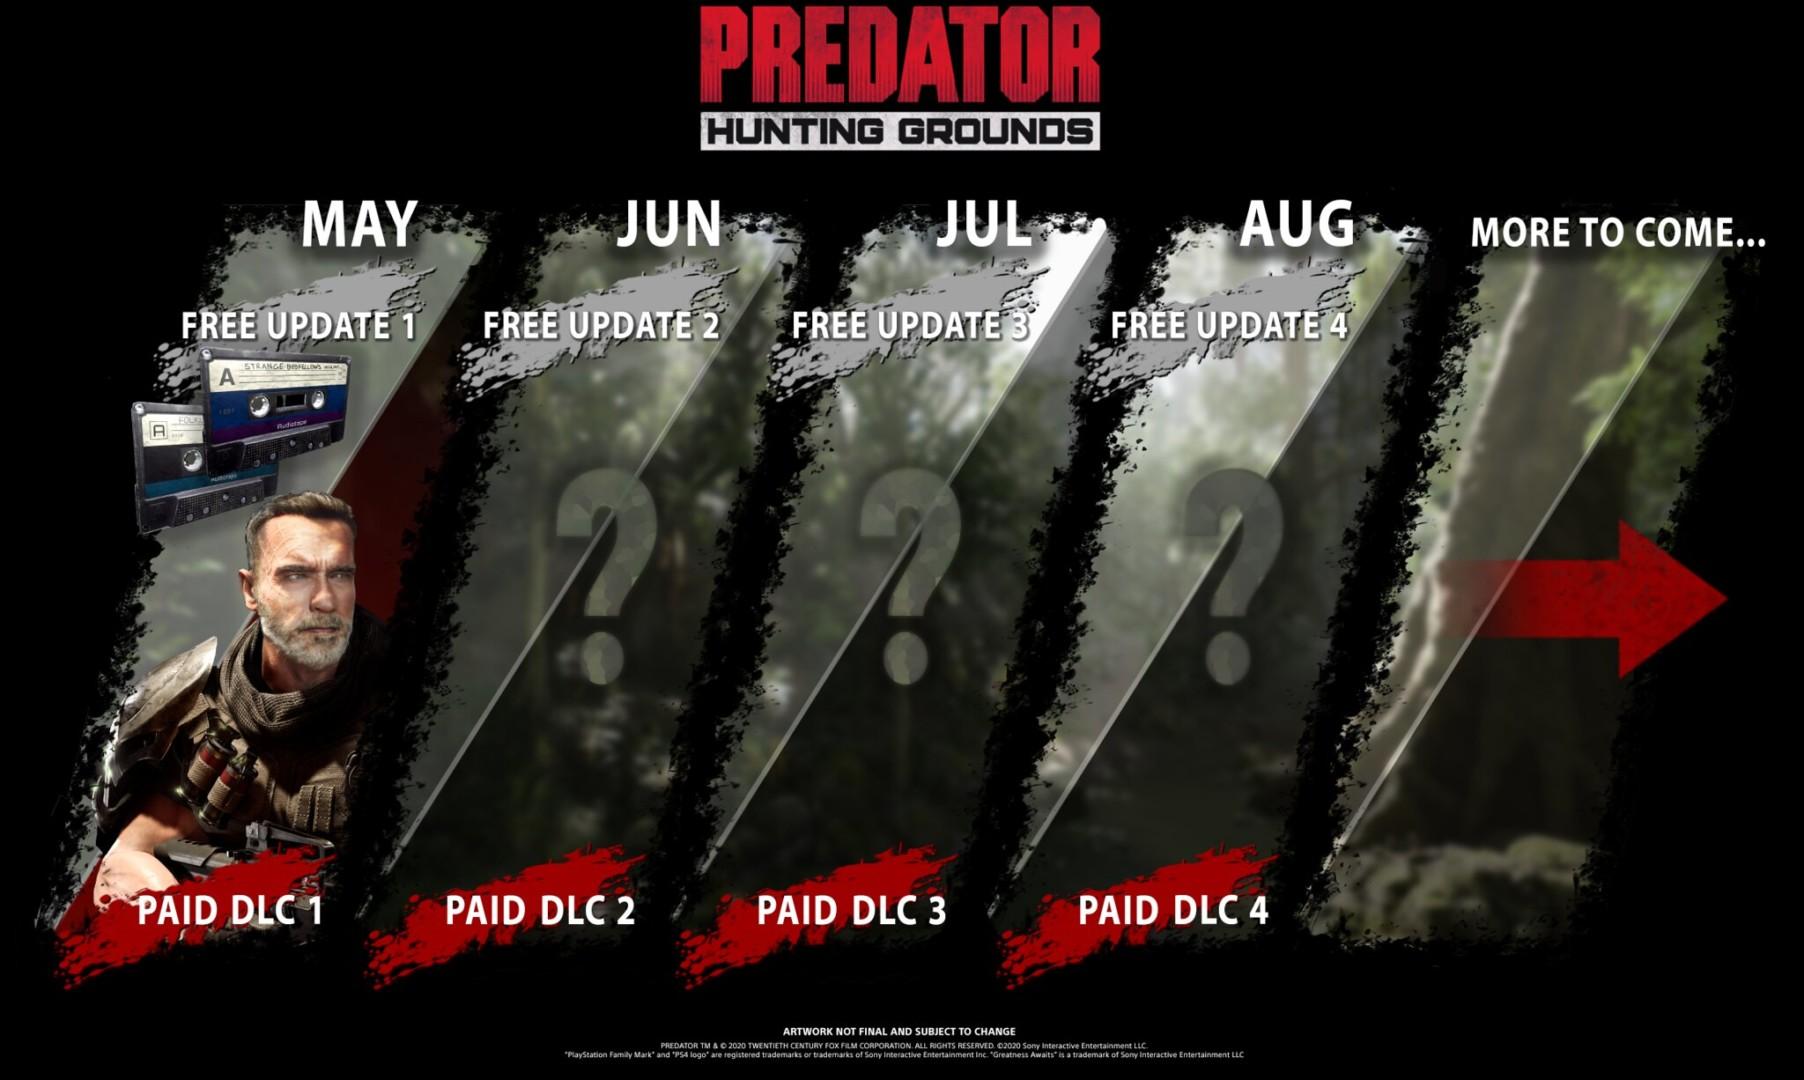 Predator Hunting Grounds Roadmap